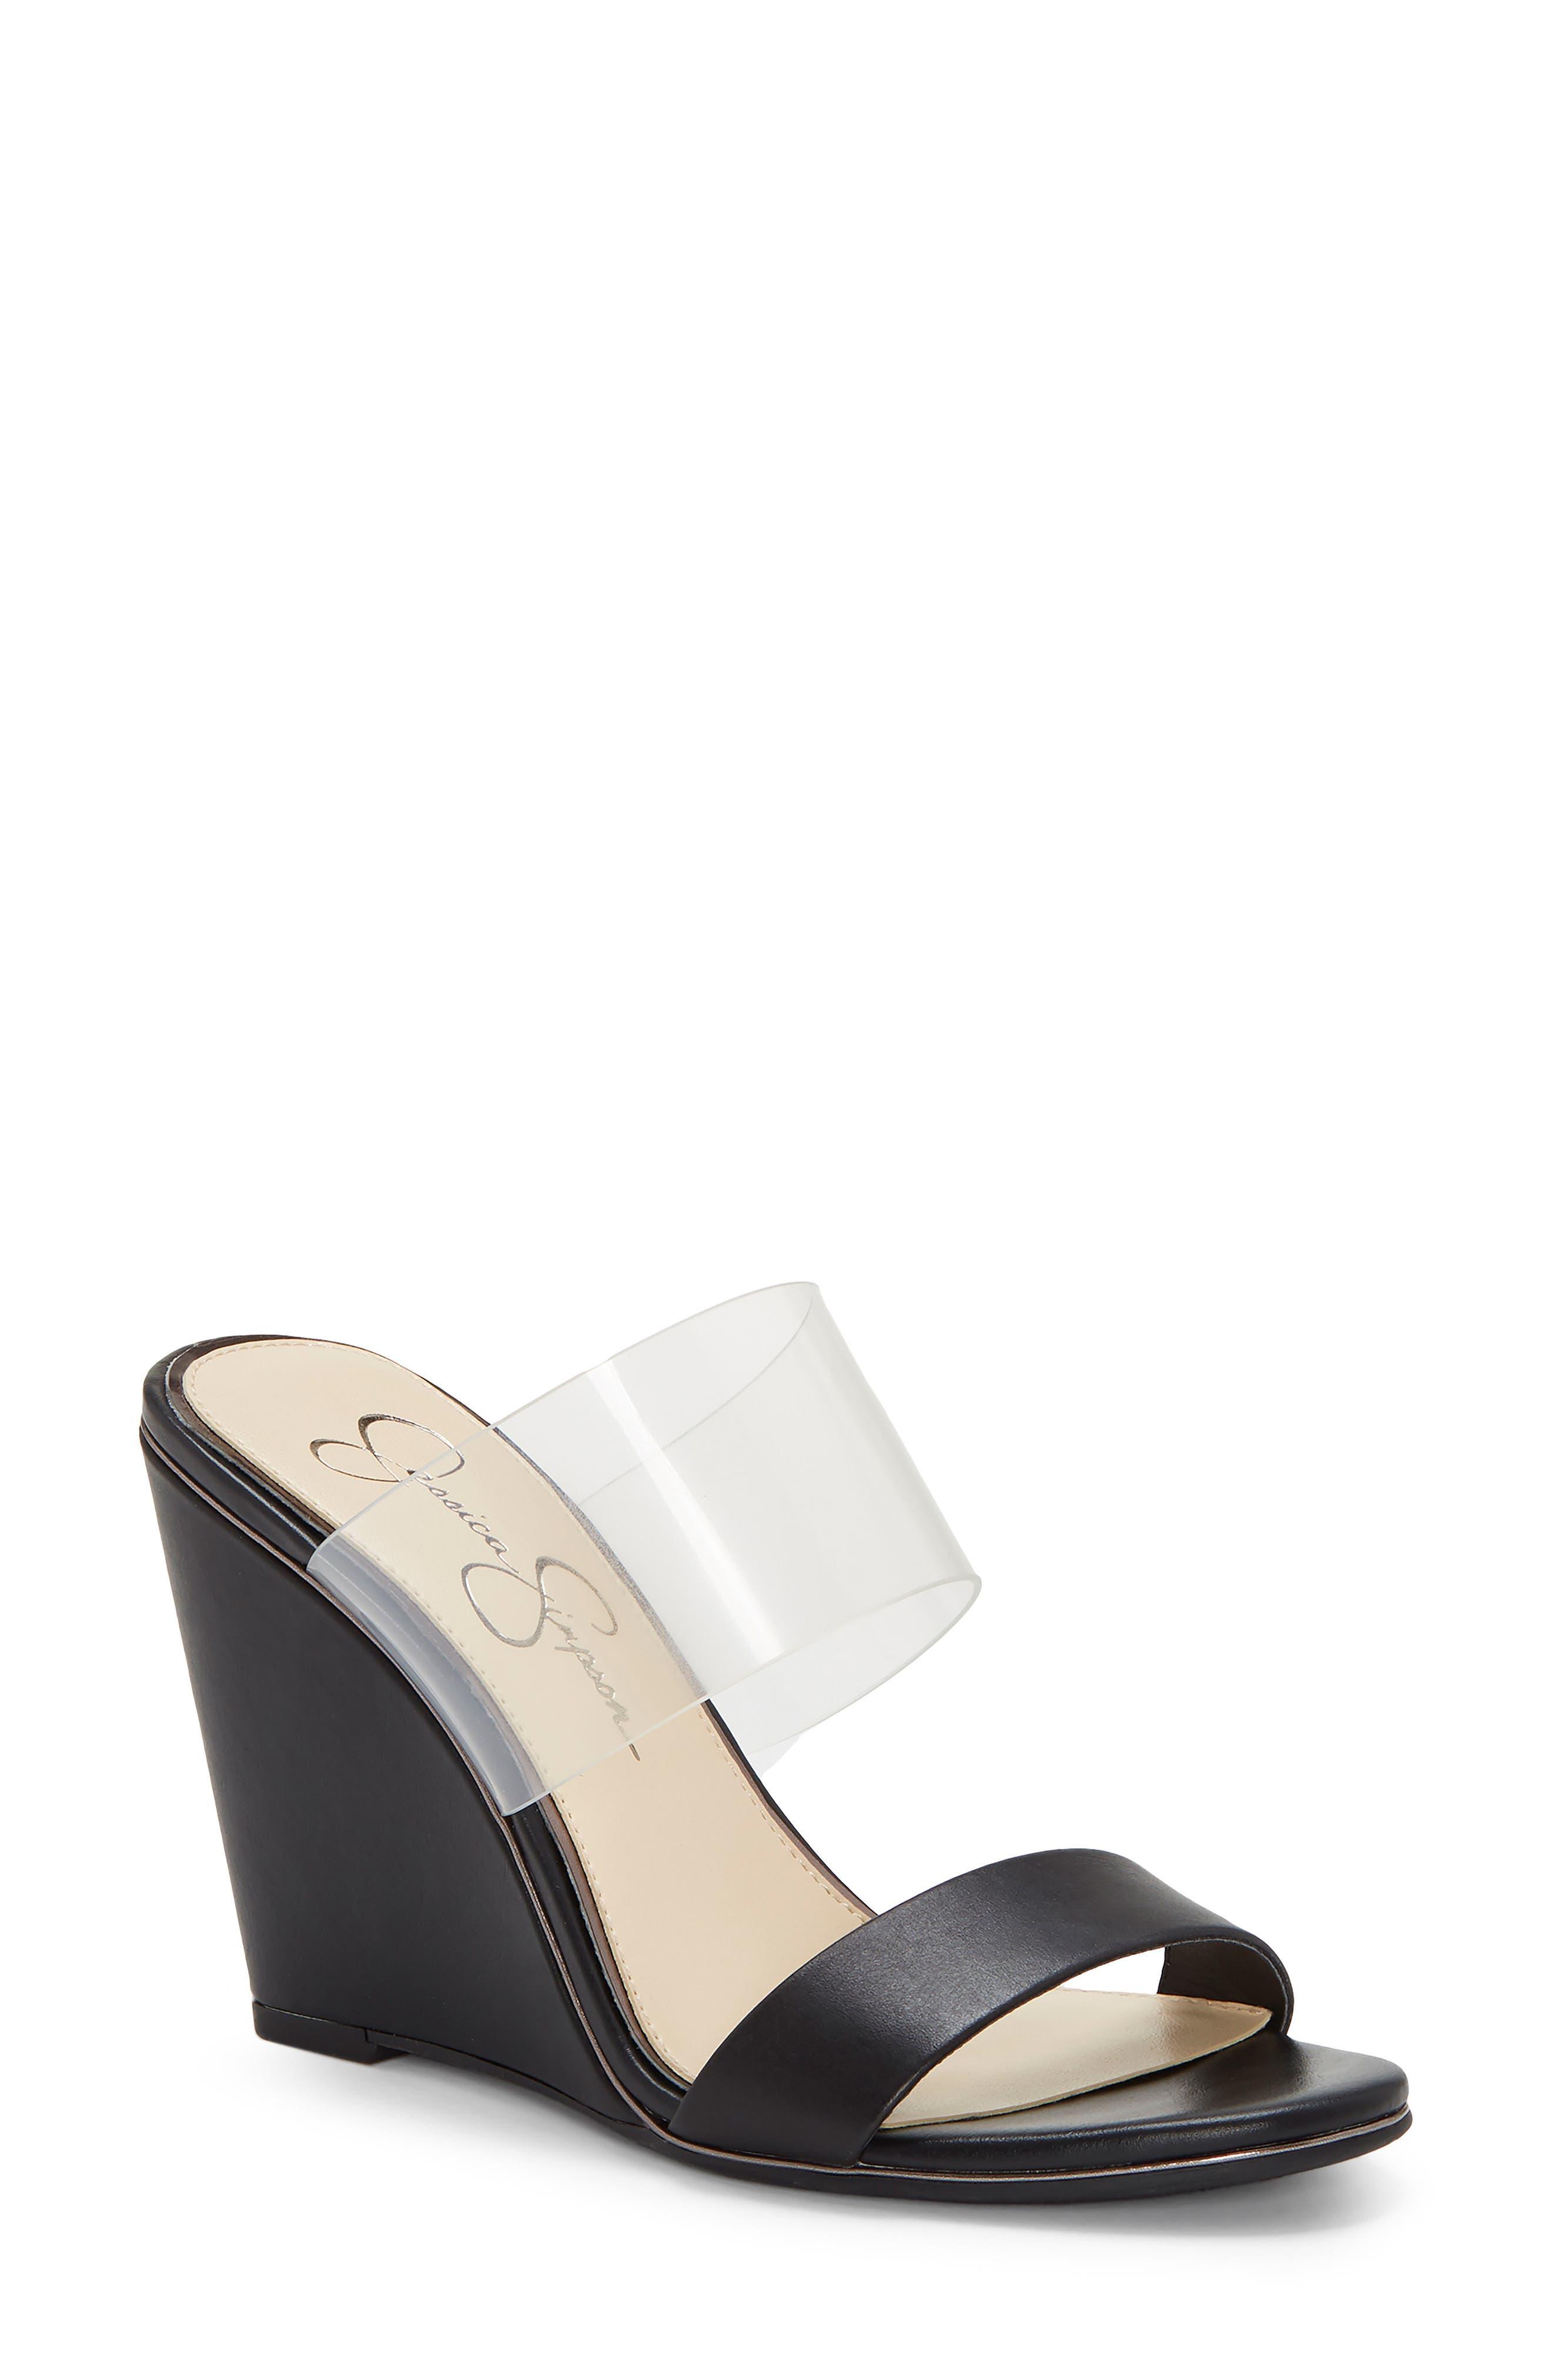 Jessica Simpson Winsty Wedge Slide Sandal- Black